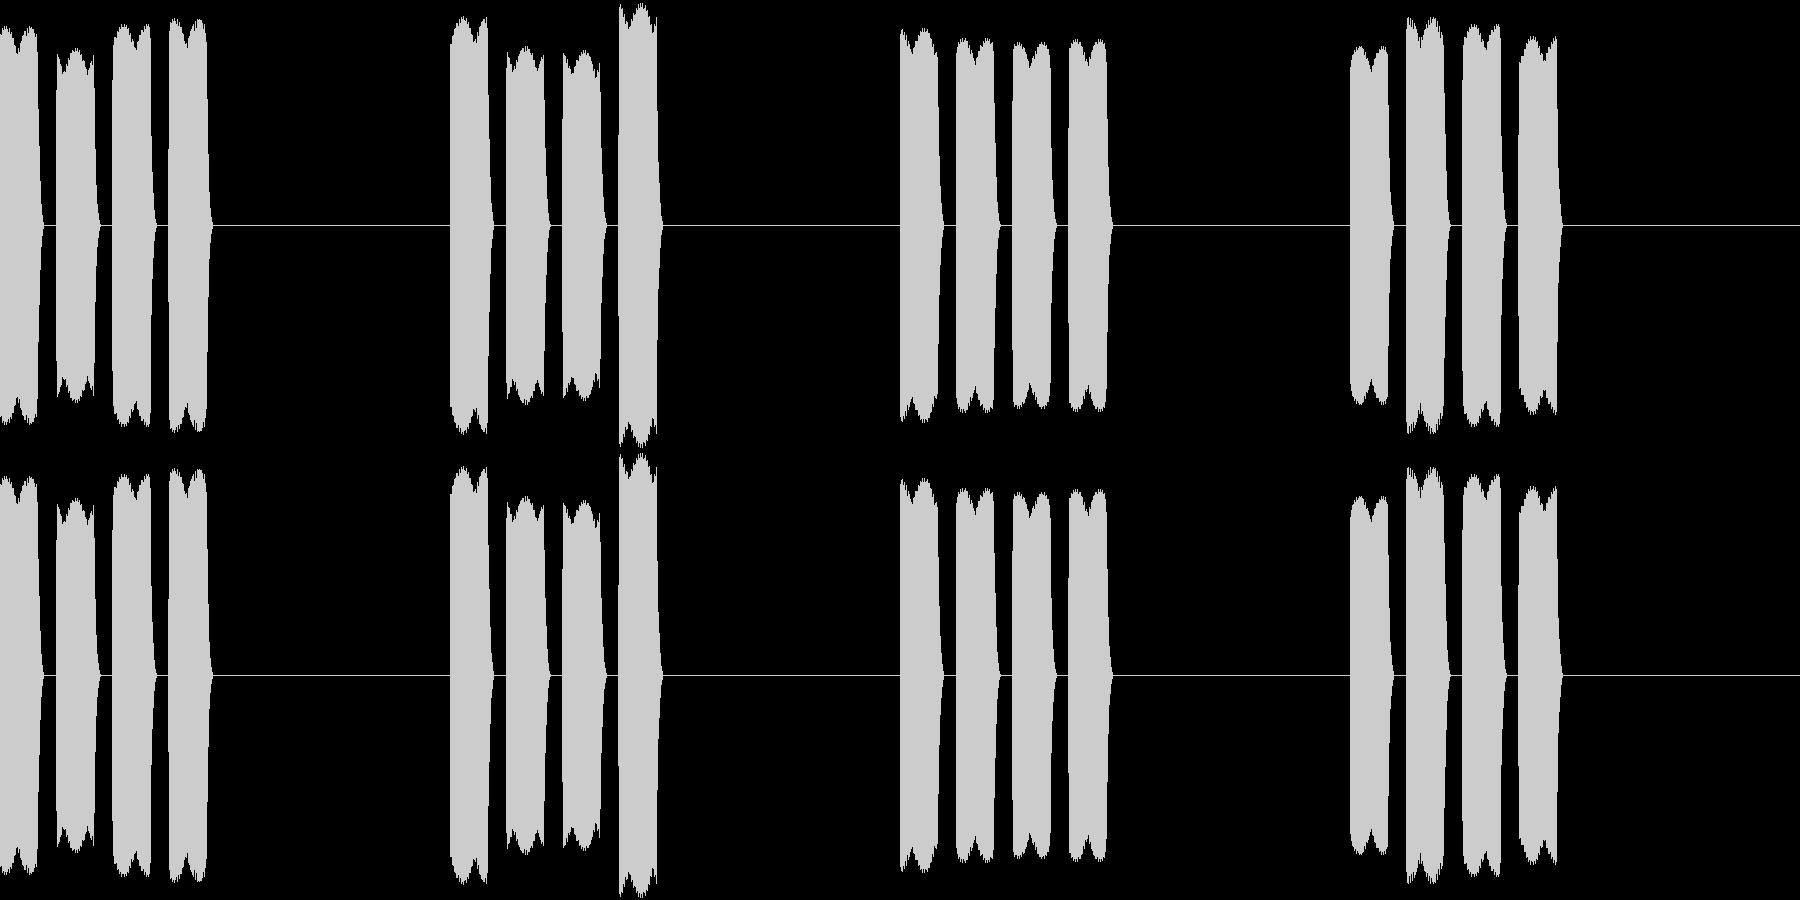 Thermo 体温計の音 ピピピピッ 3の未再生の波形